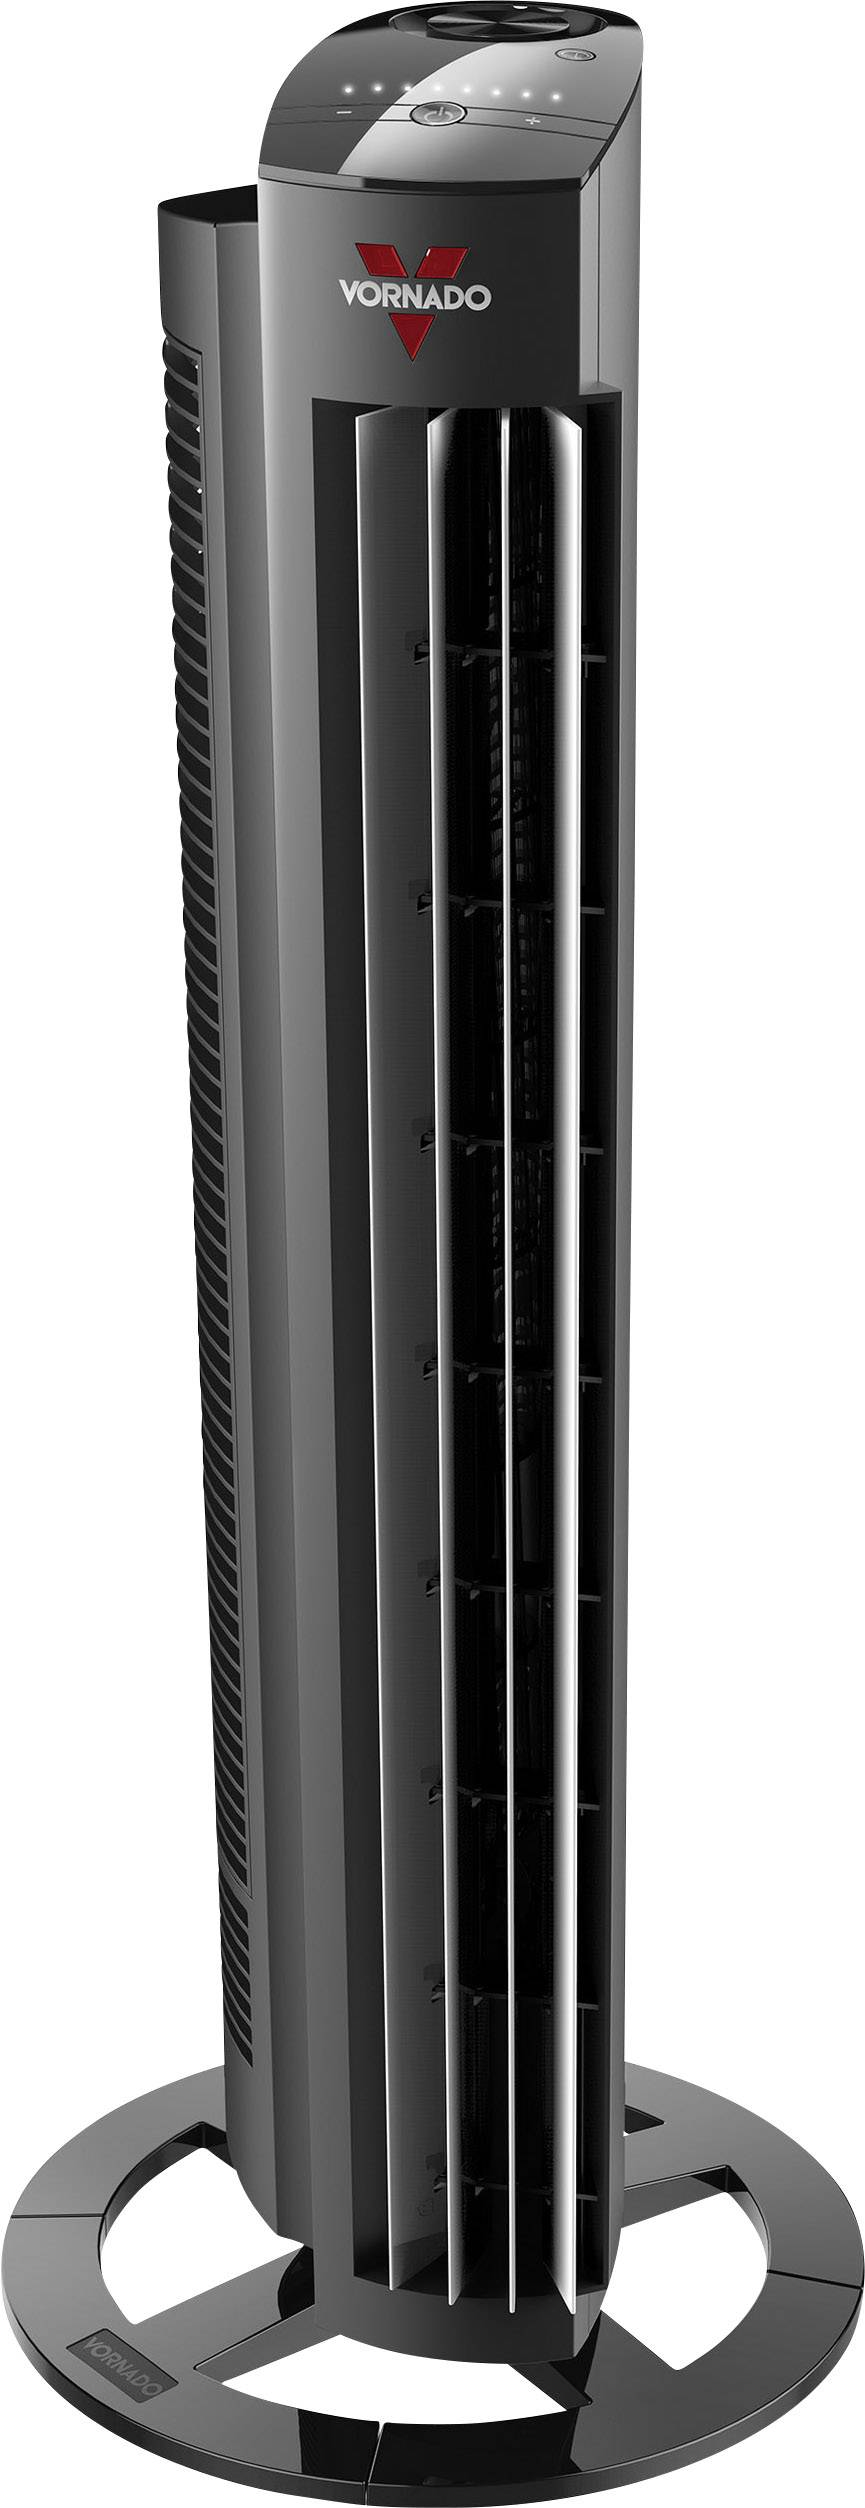 Conrad-Vornado  Torenventilator 78 W (Ø x h) 28 cm x 84 cm Zwart-aanbieding